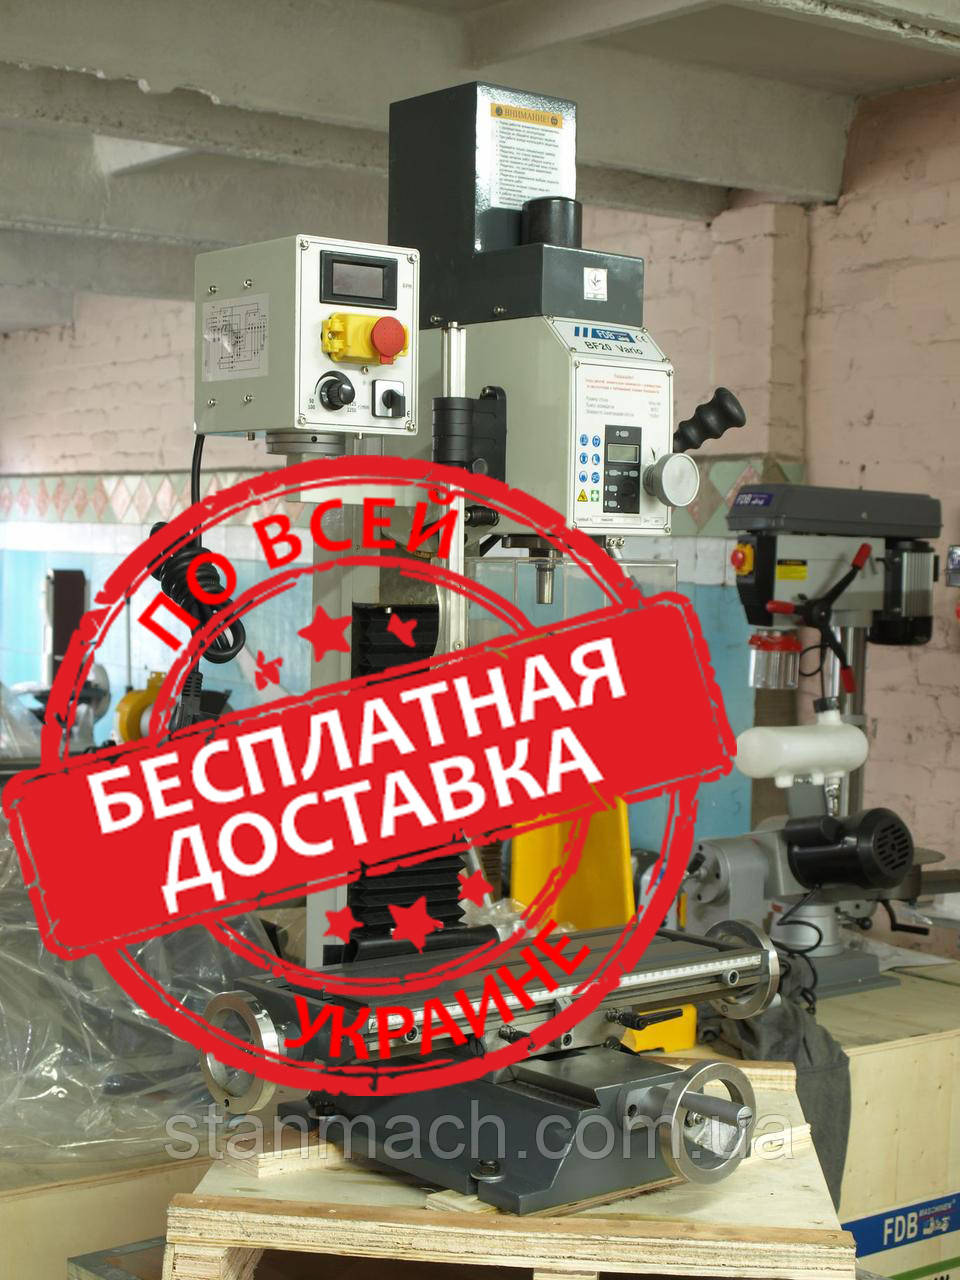 FDB Maschinen BF20 Vario настольный фрезерный станок по металлу